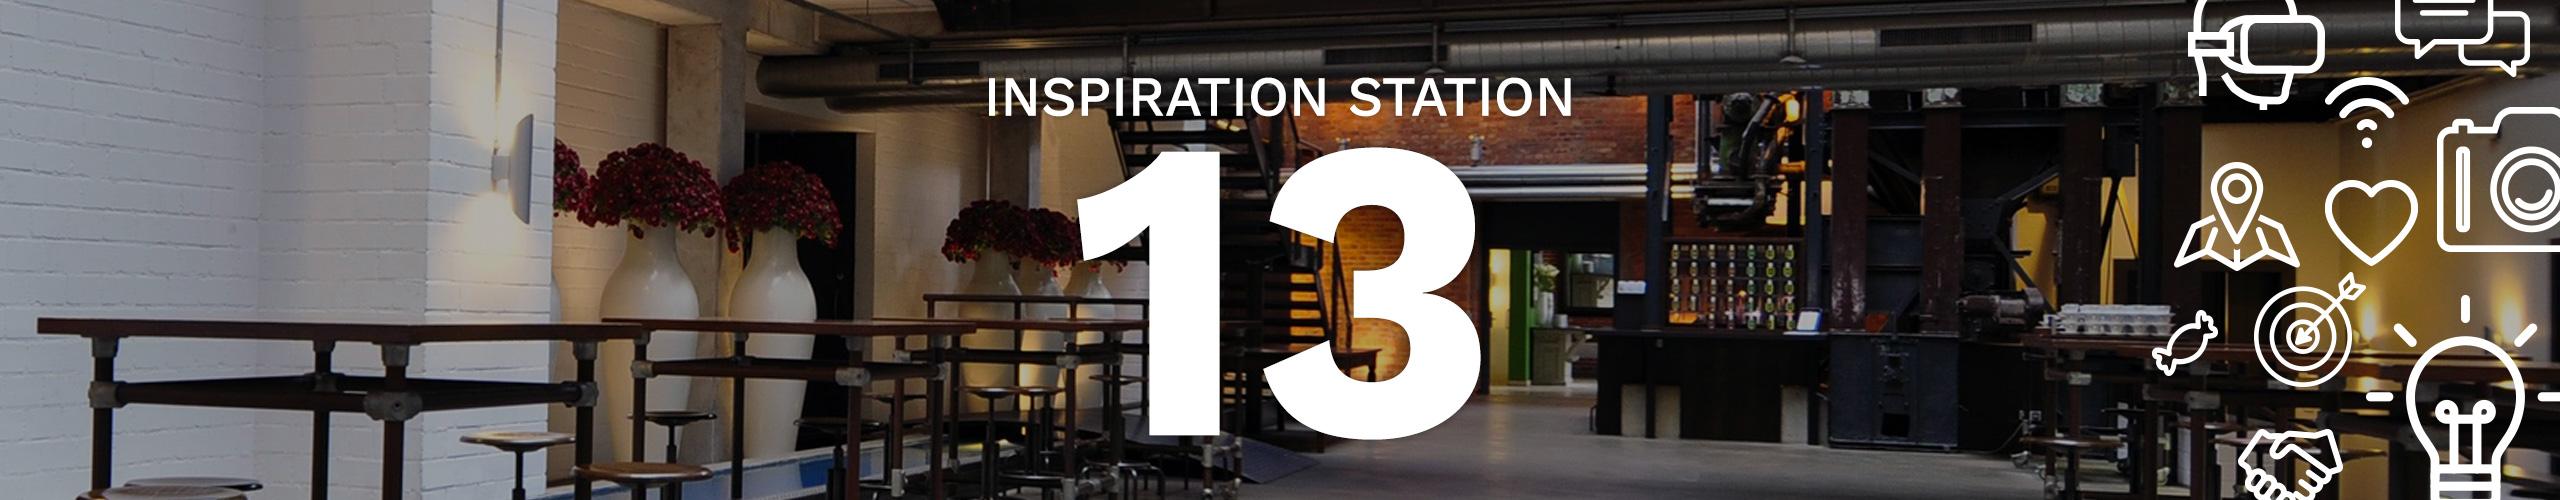 Inspiration Station <br/>Vol. 13